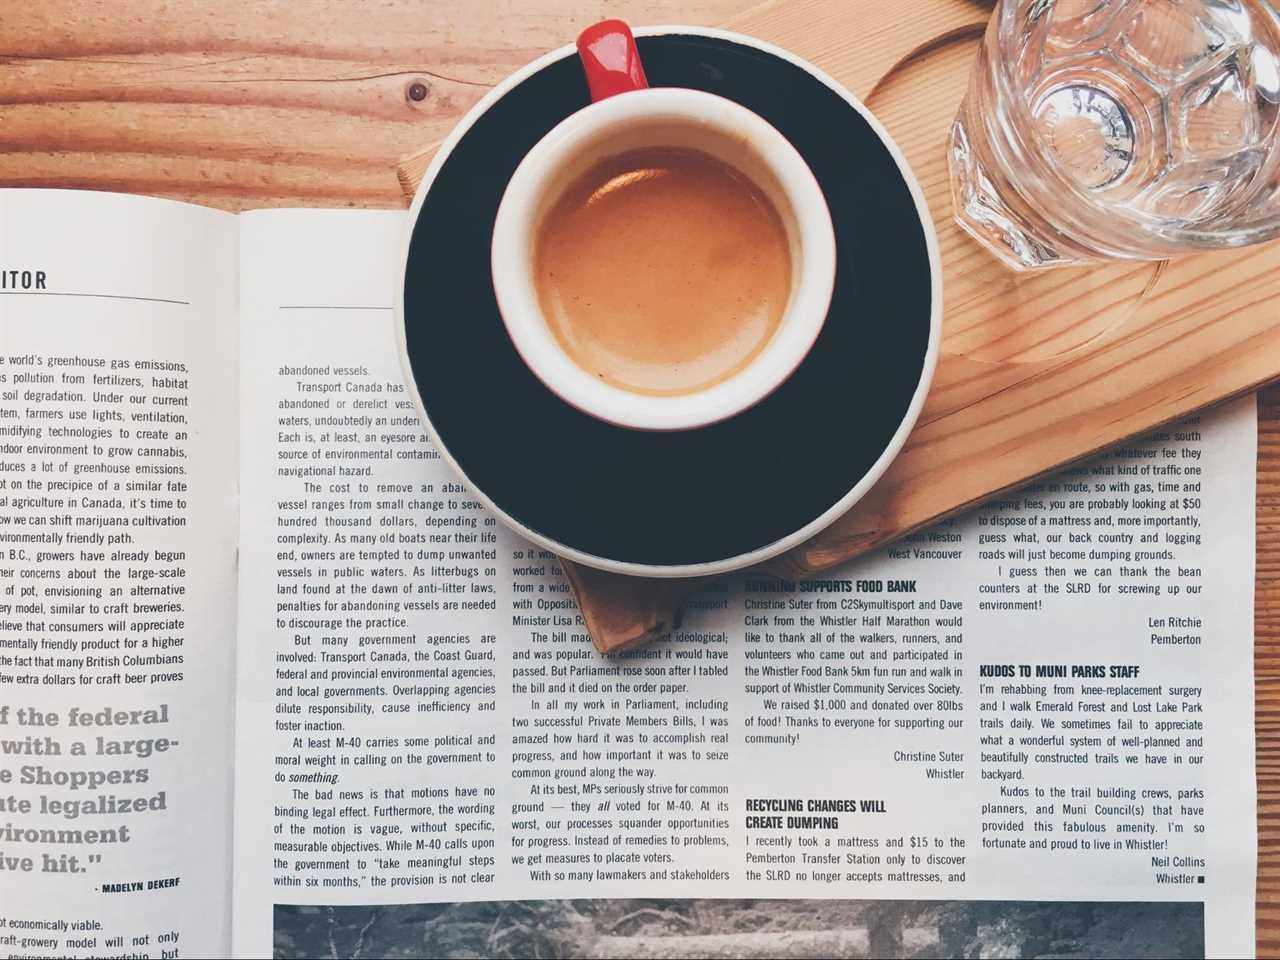 Restaurant marketing in the newspaper